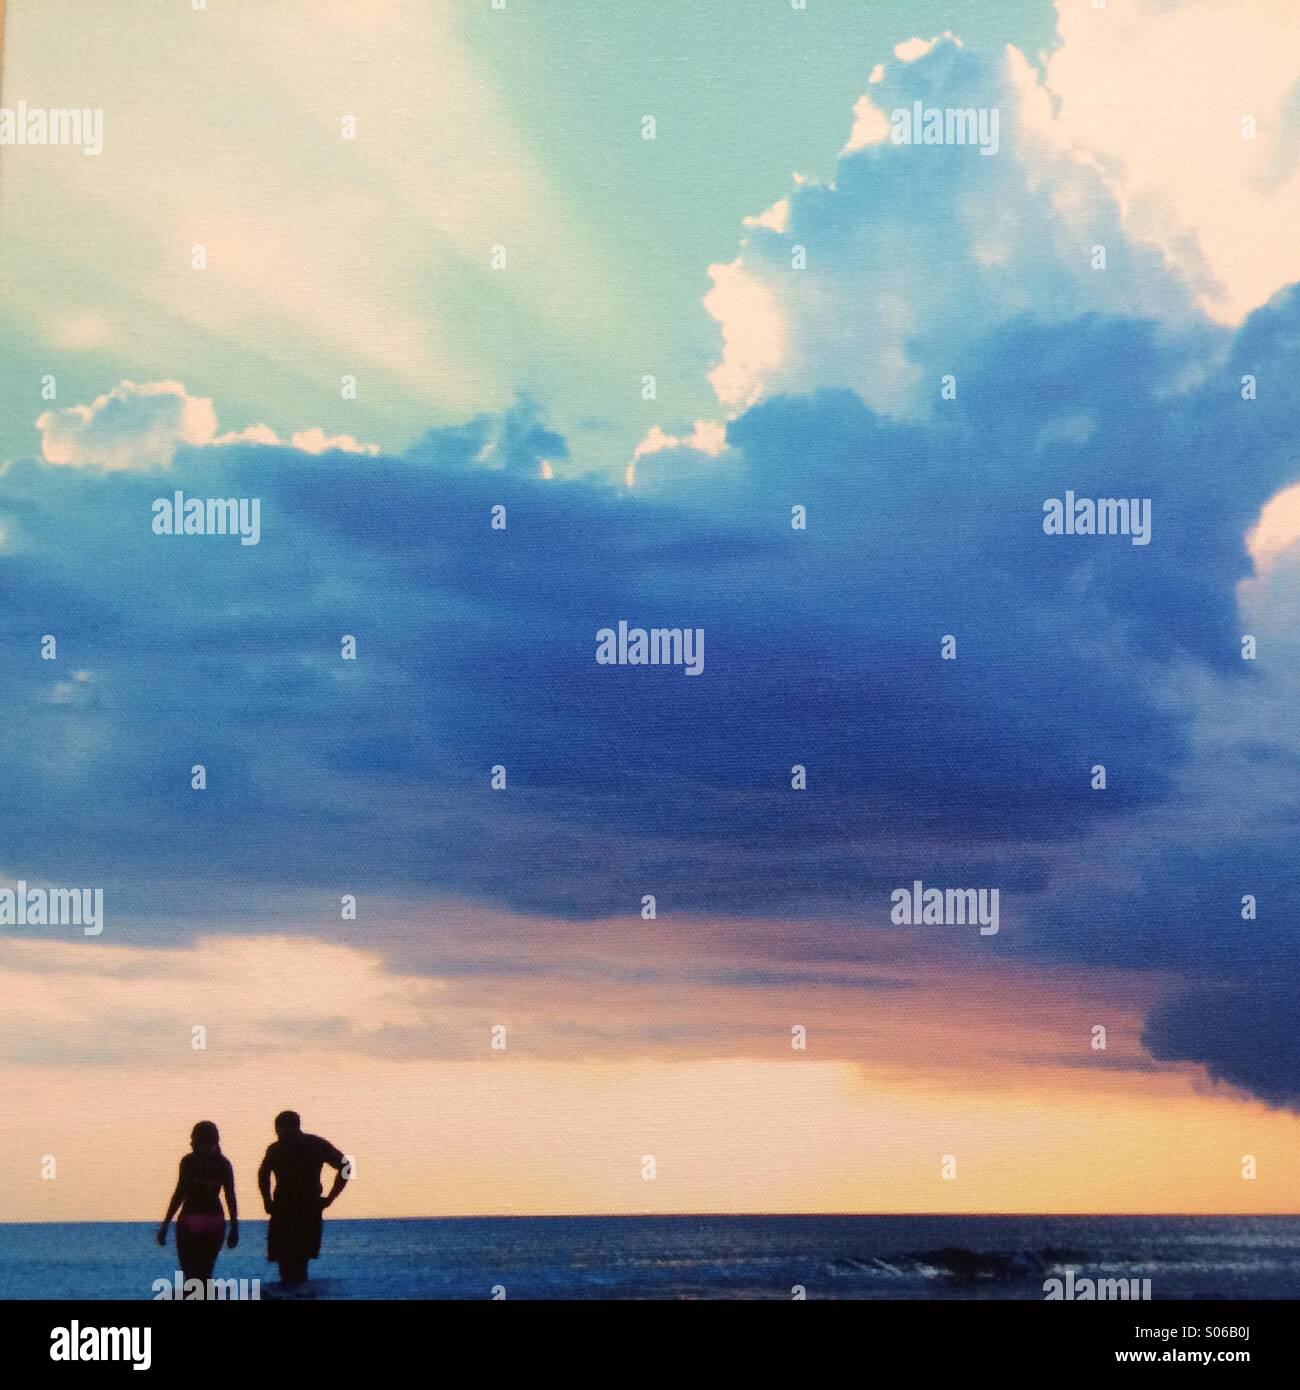 Storm show - Stock Image